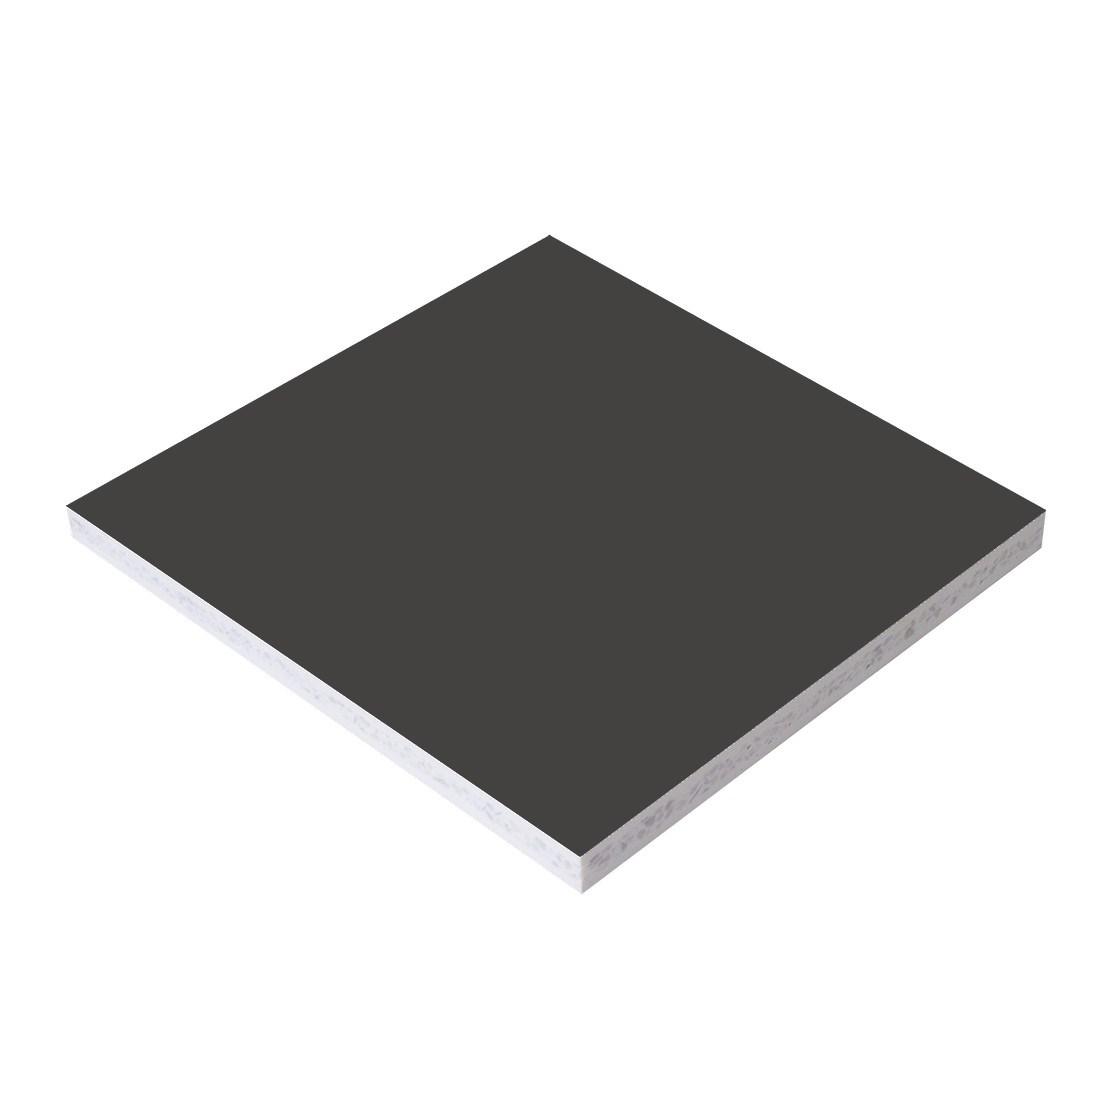 Steni Gevelplaat Colour Antraciet Sn 8008 hm 8000-n 2995x1195x6mm